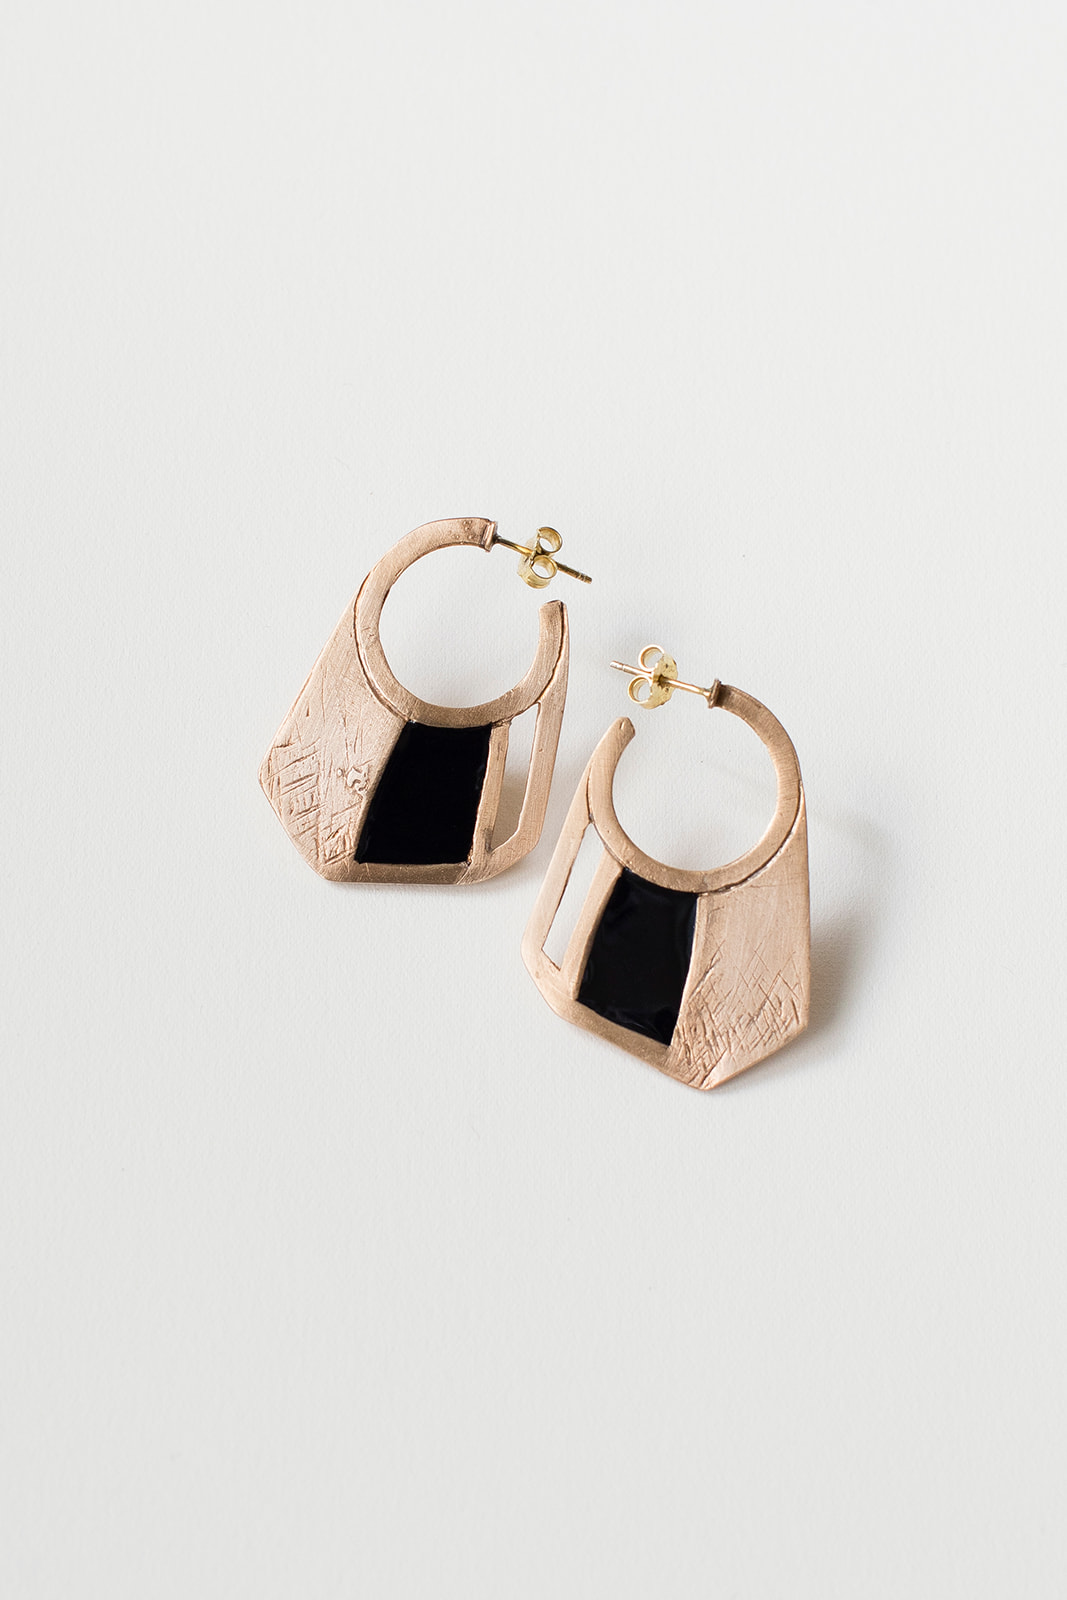 Midorj Earrings - Northia's Collection 2020